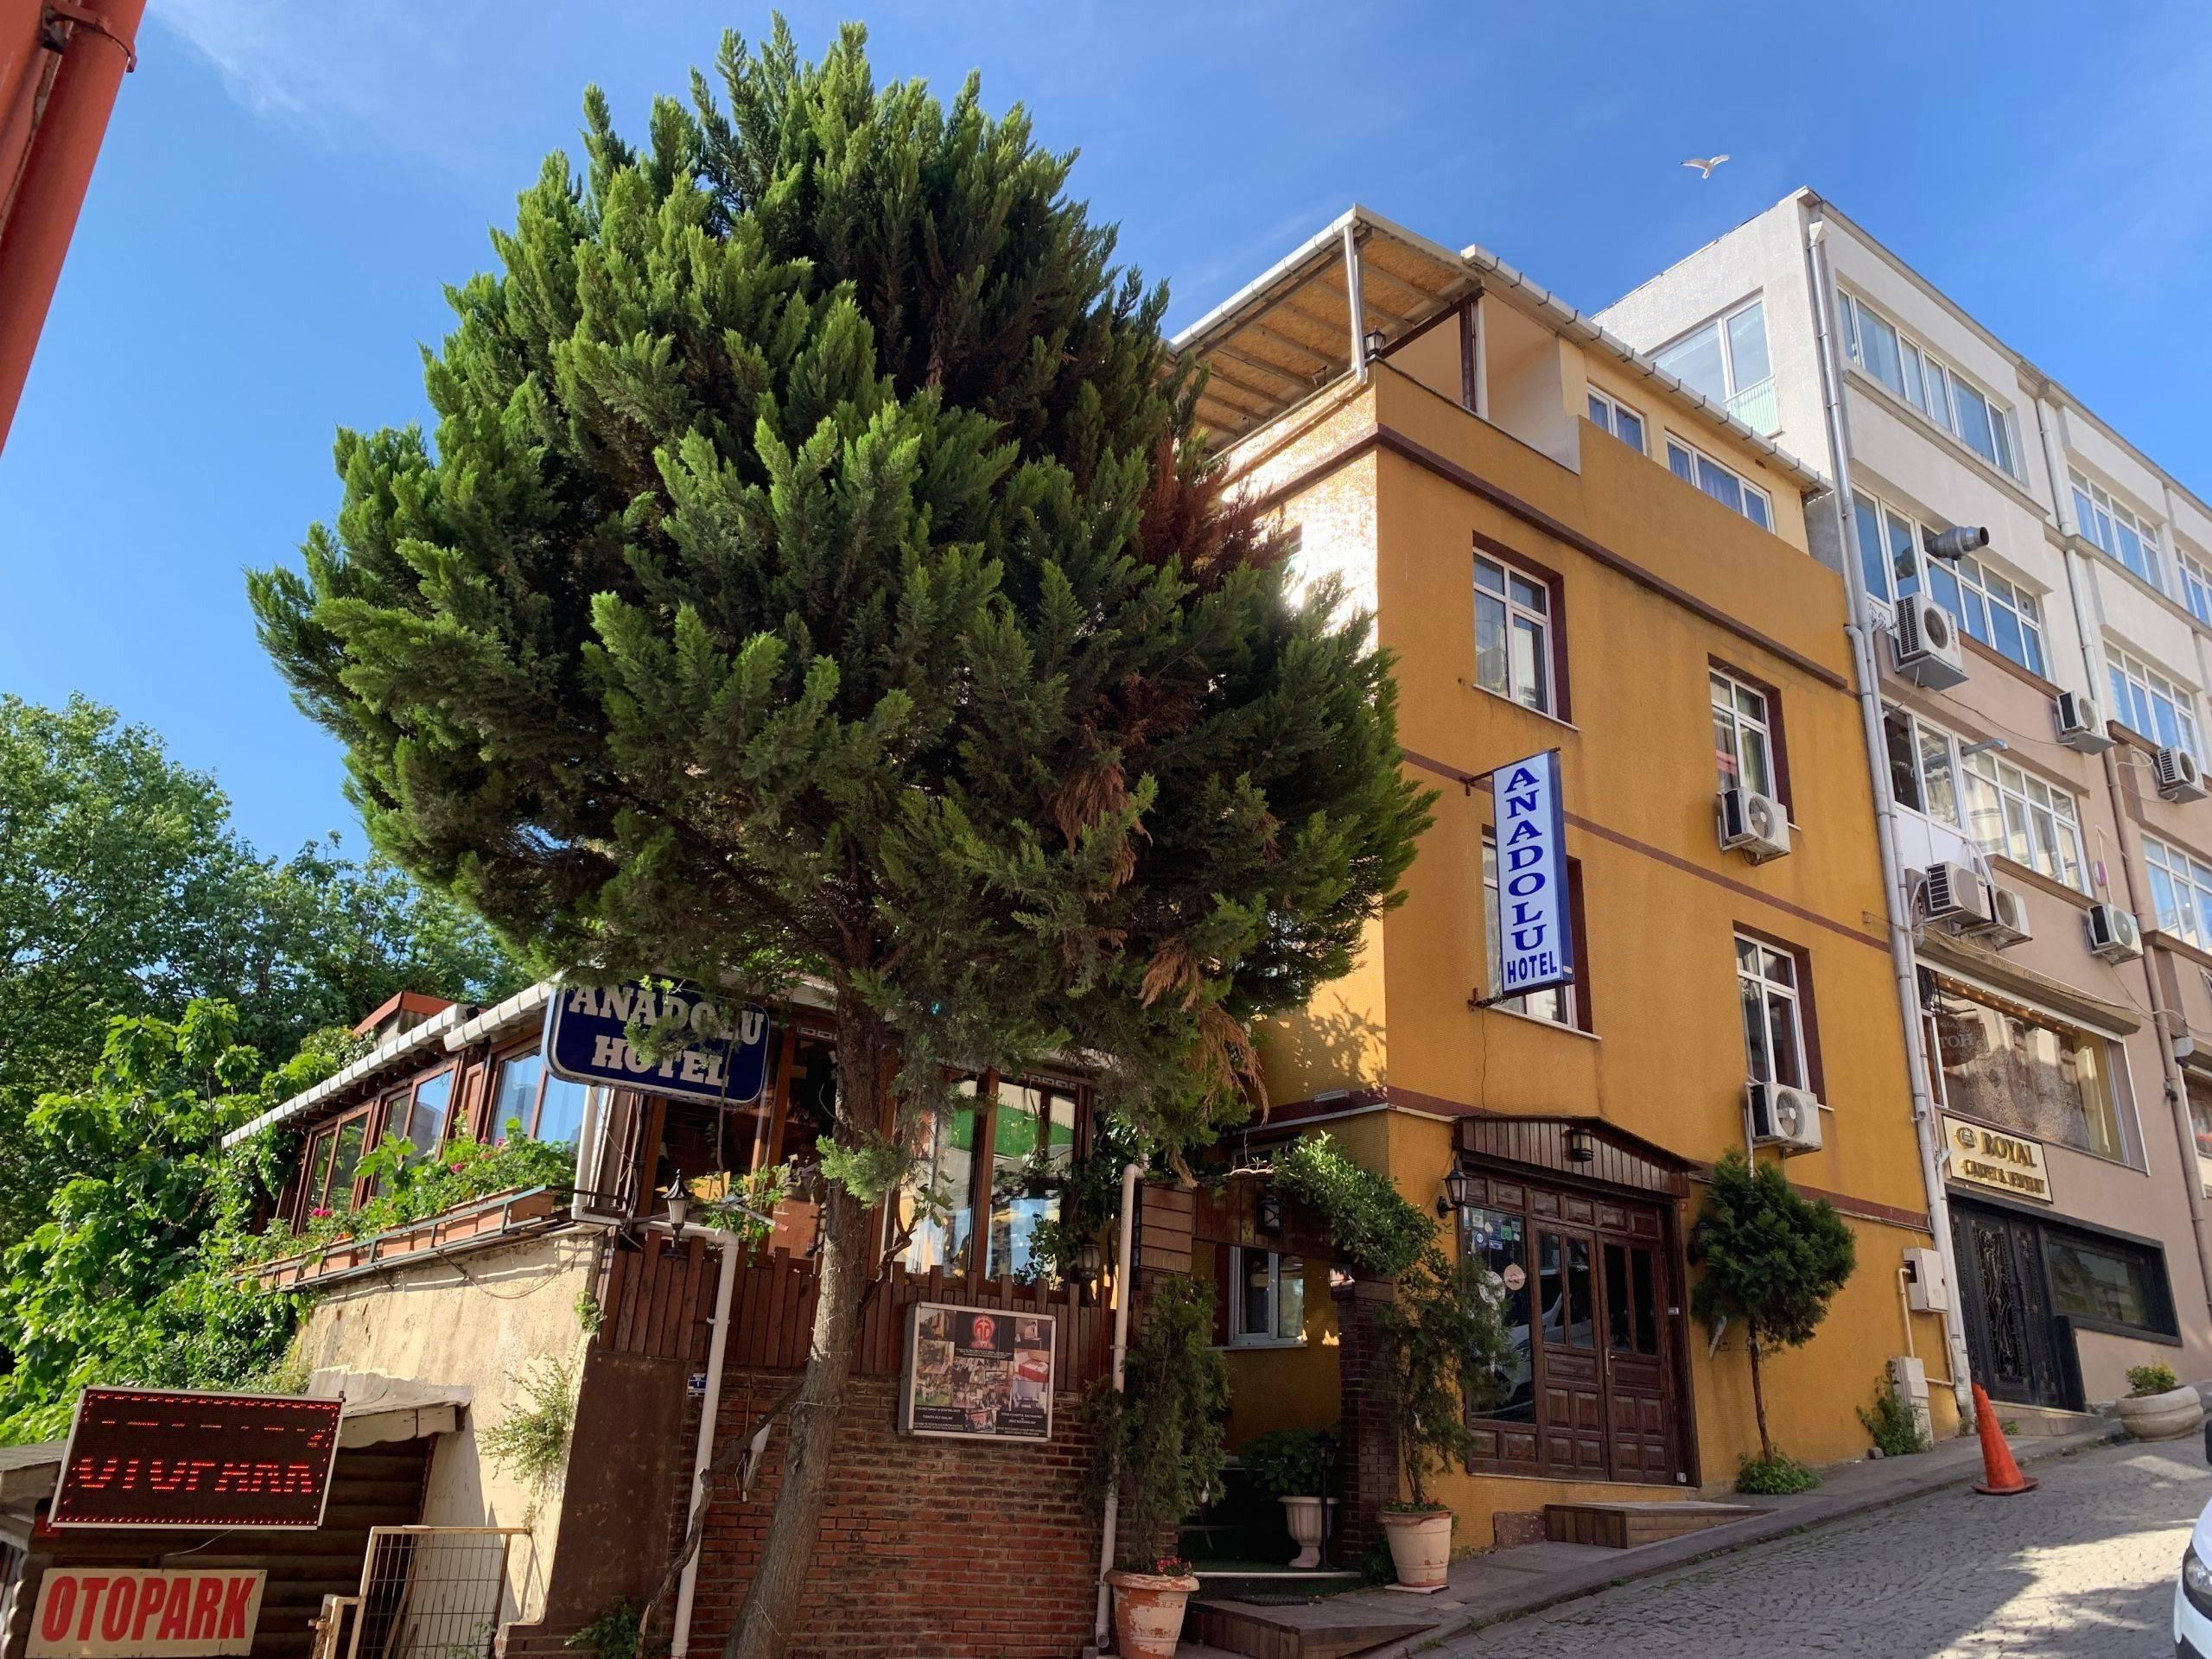 Anadolu Otel İstanbul, İstanbul, Sultanahmet, 33432